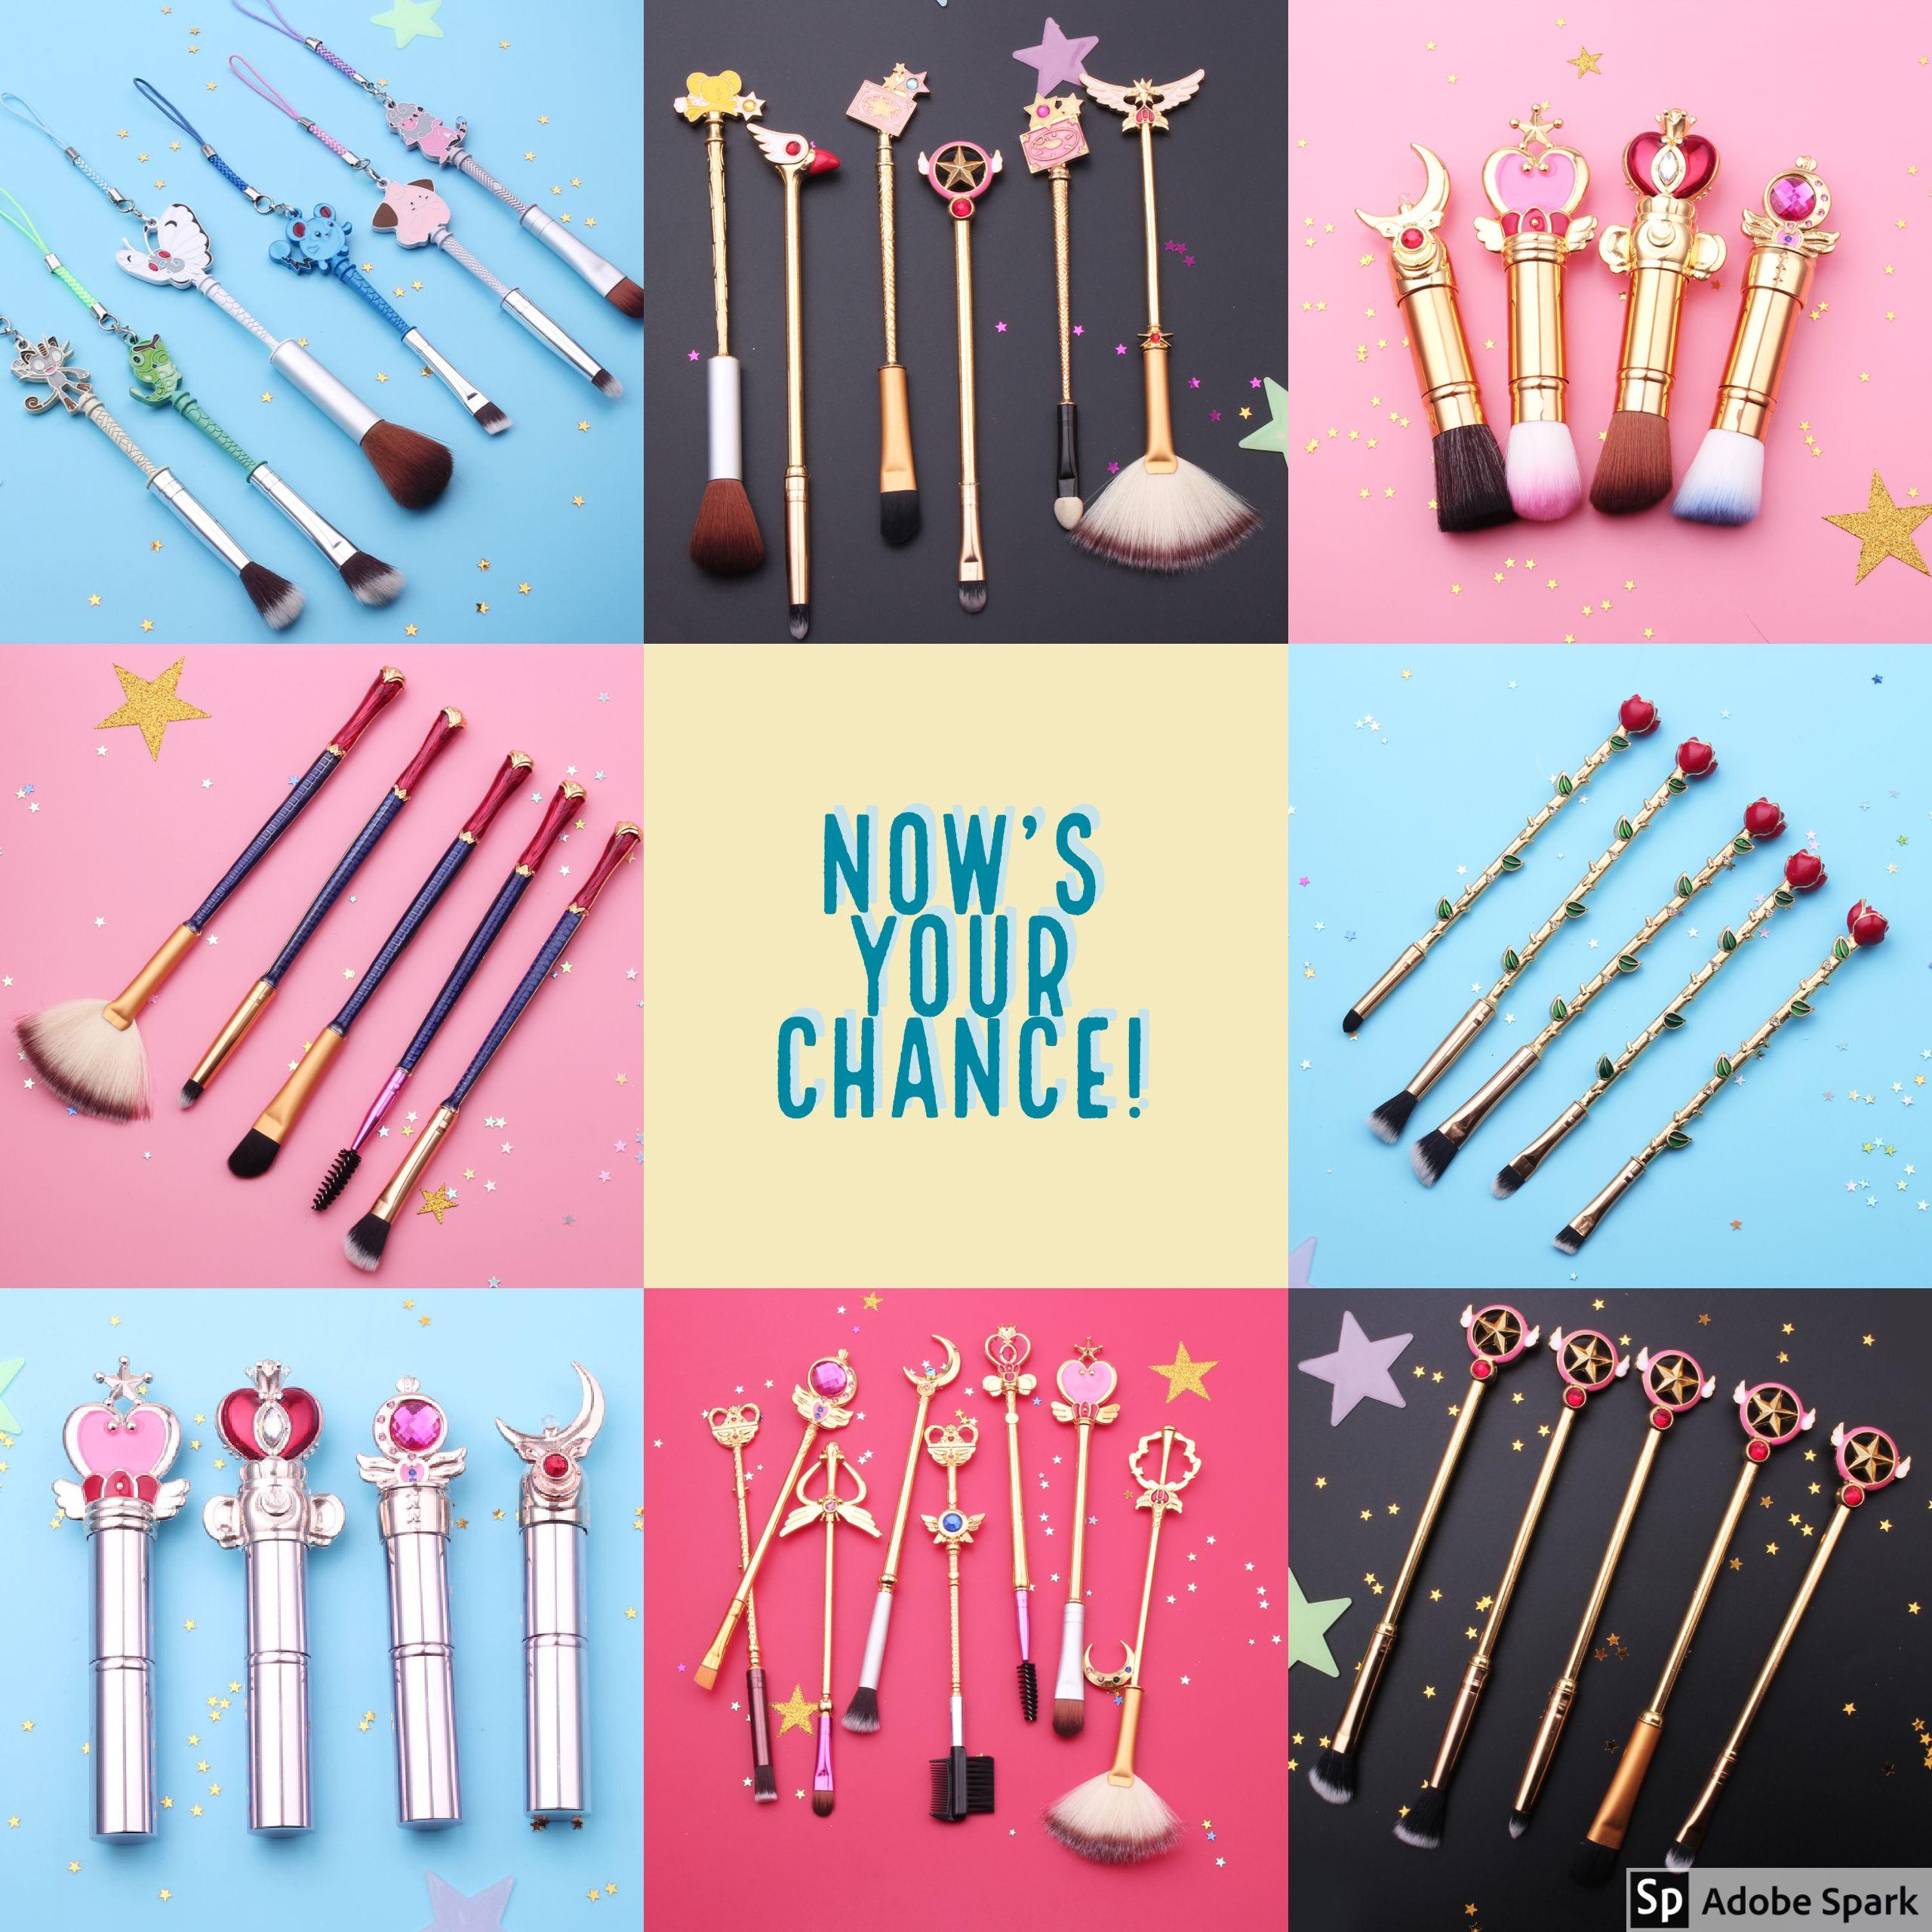 Get your favorite makeup brush sets during our Super Sale